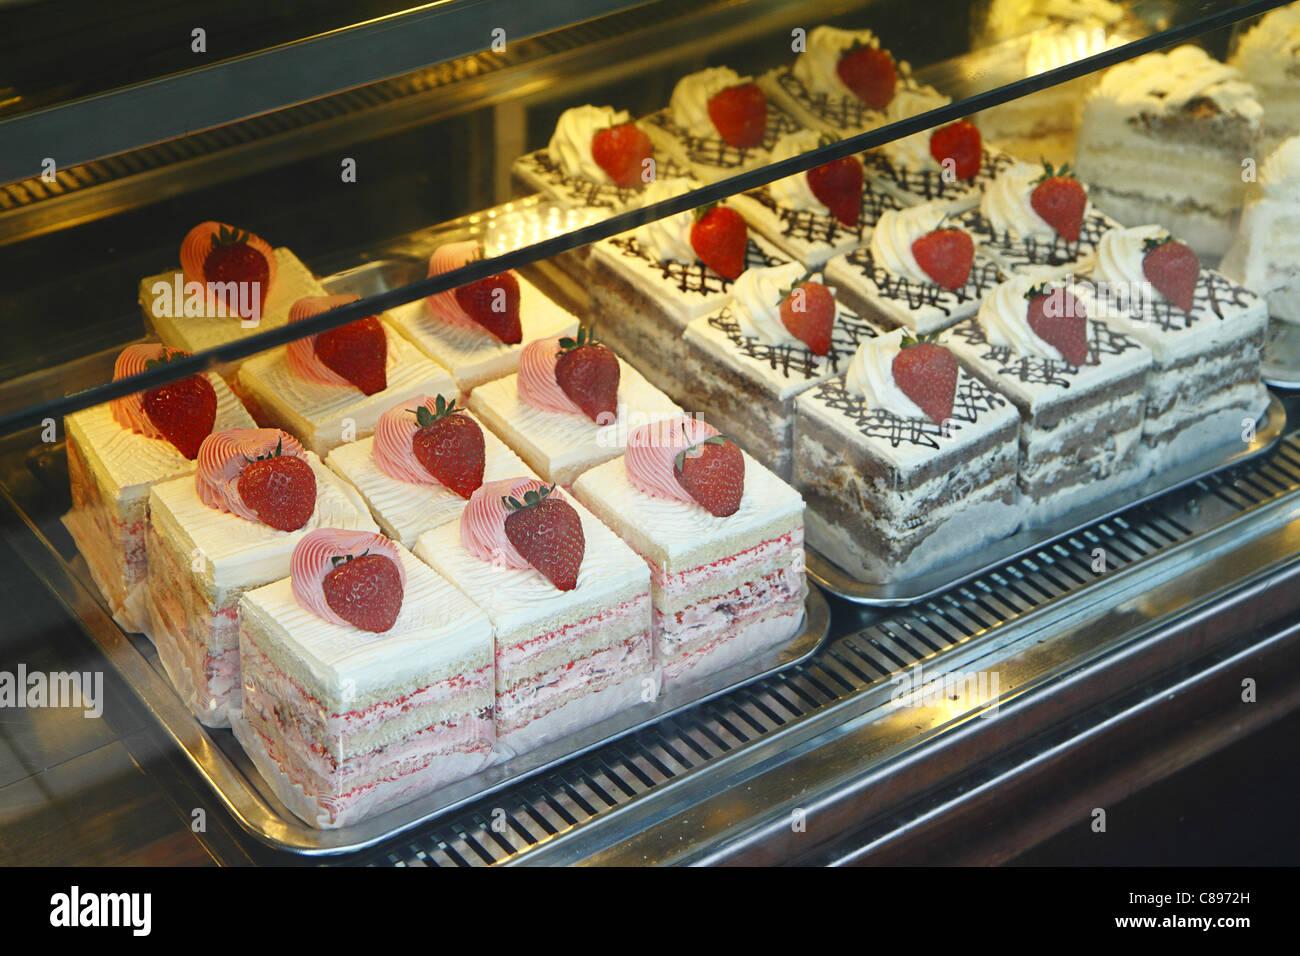 Erdbeer Sahnetorten in Konditorei, London, UK Stockfoto